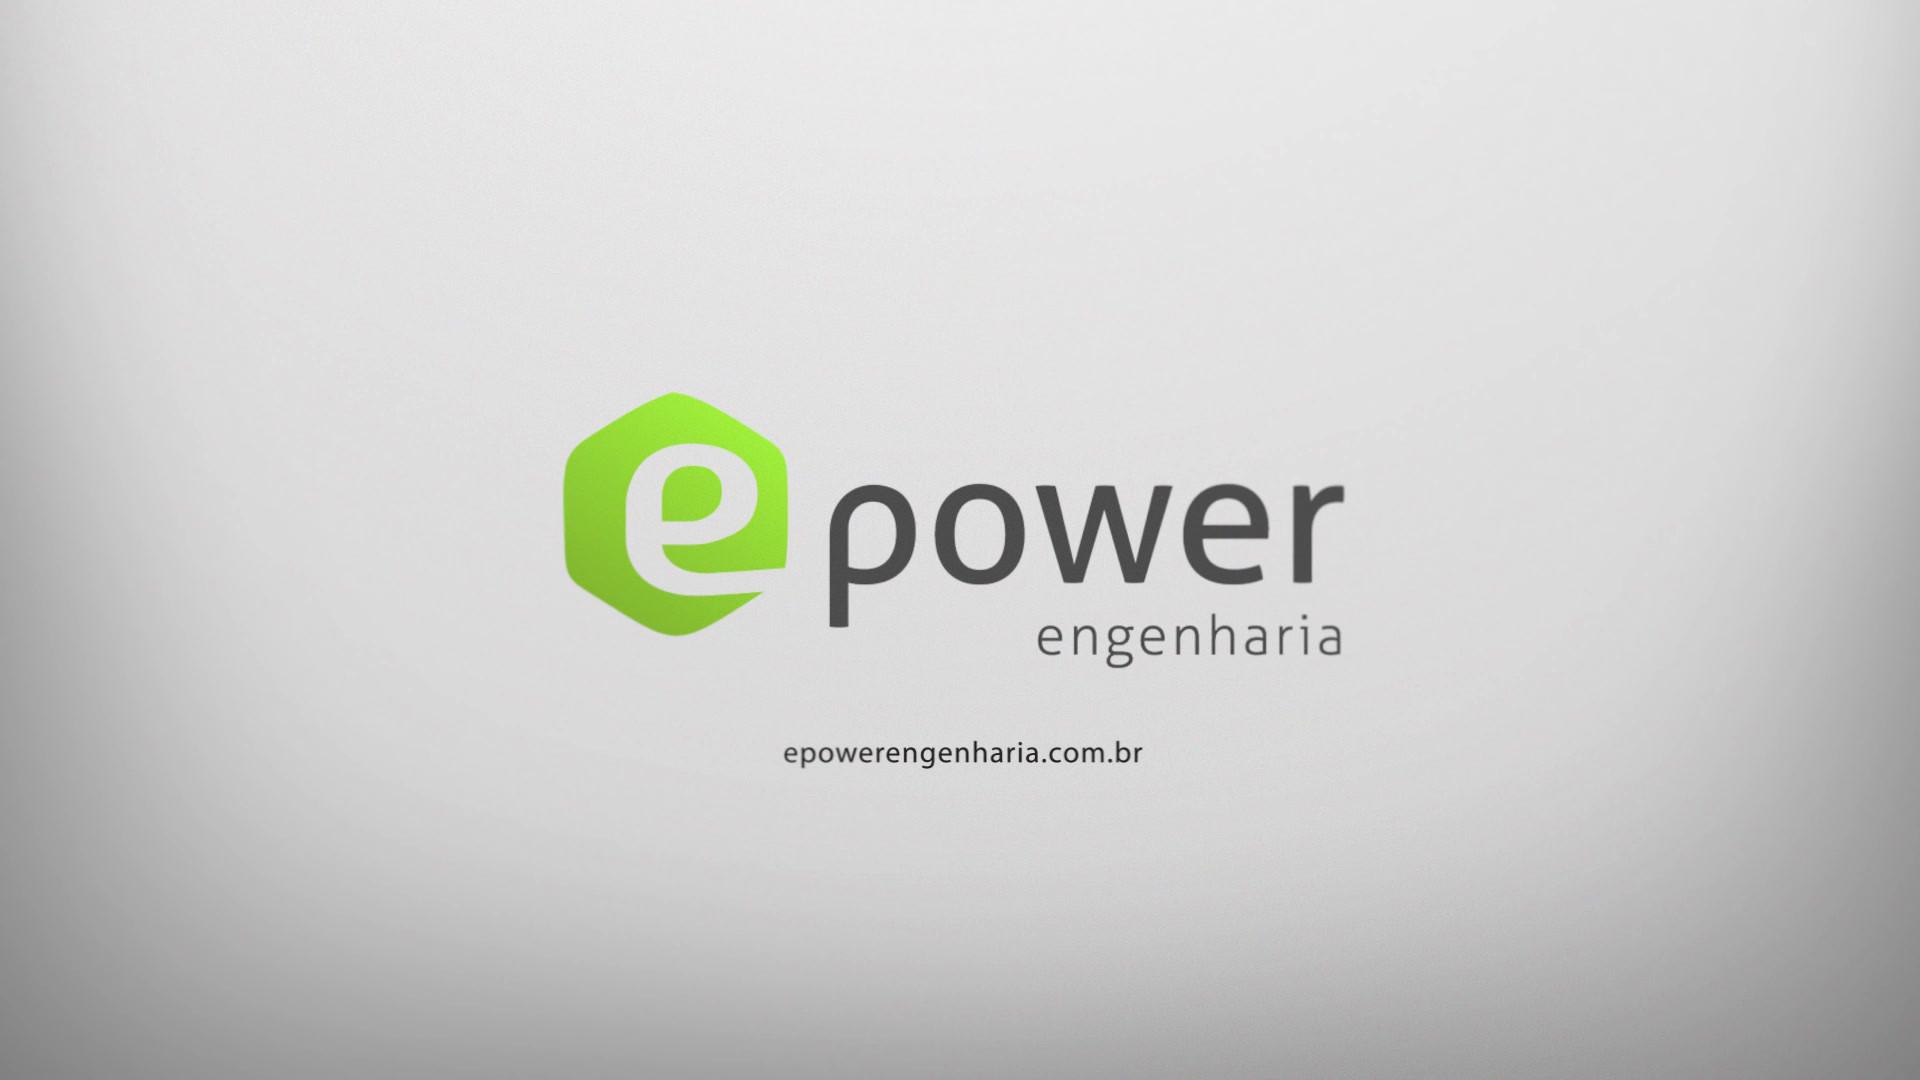 Epower Engenharia